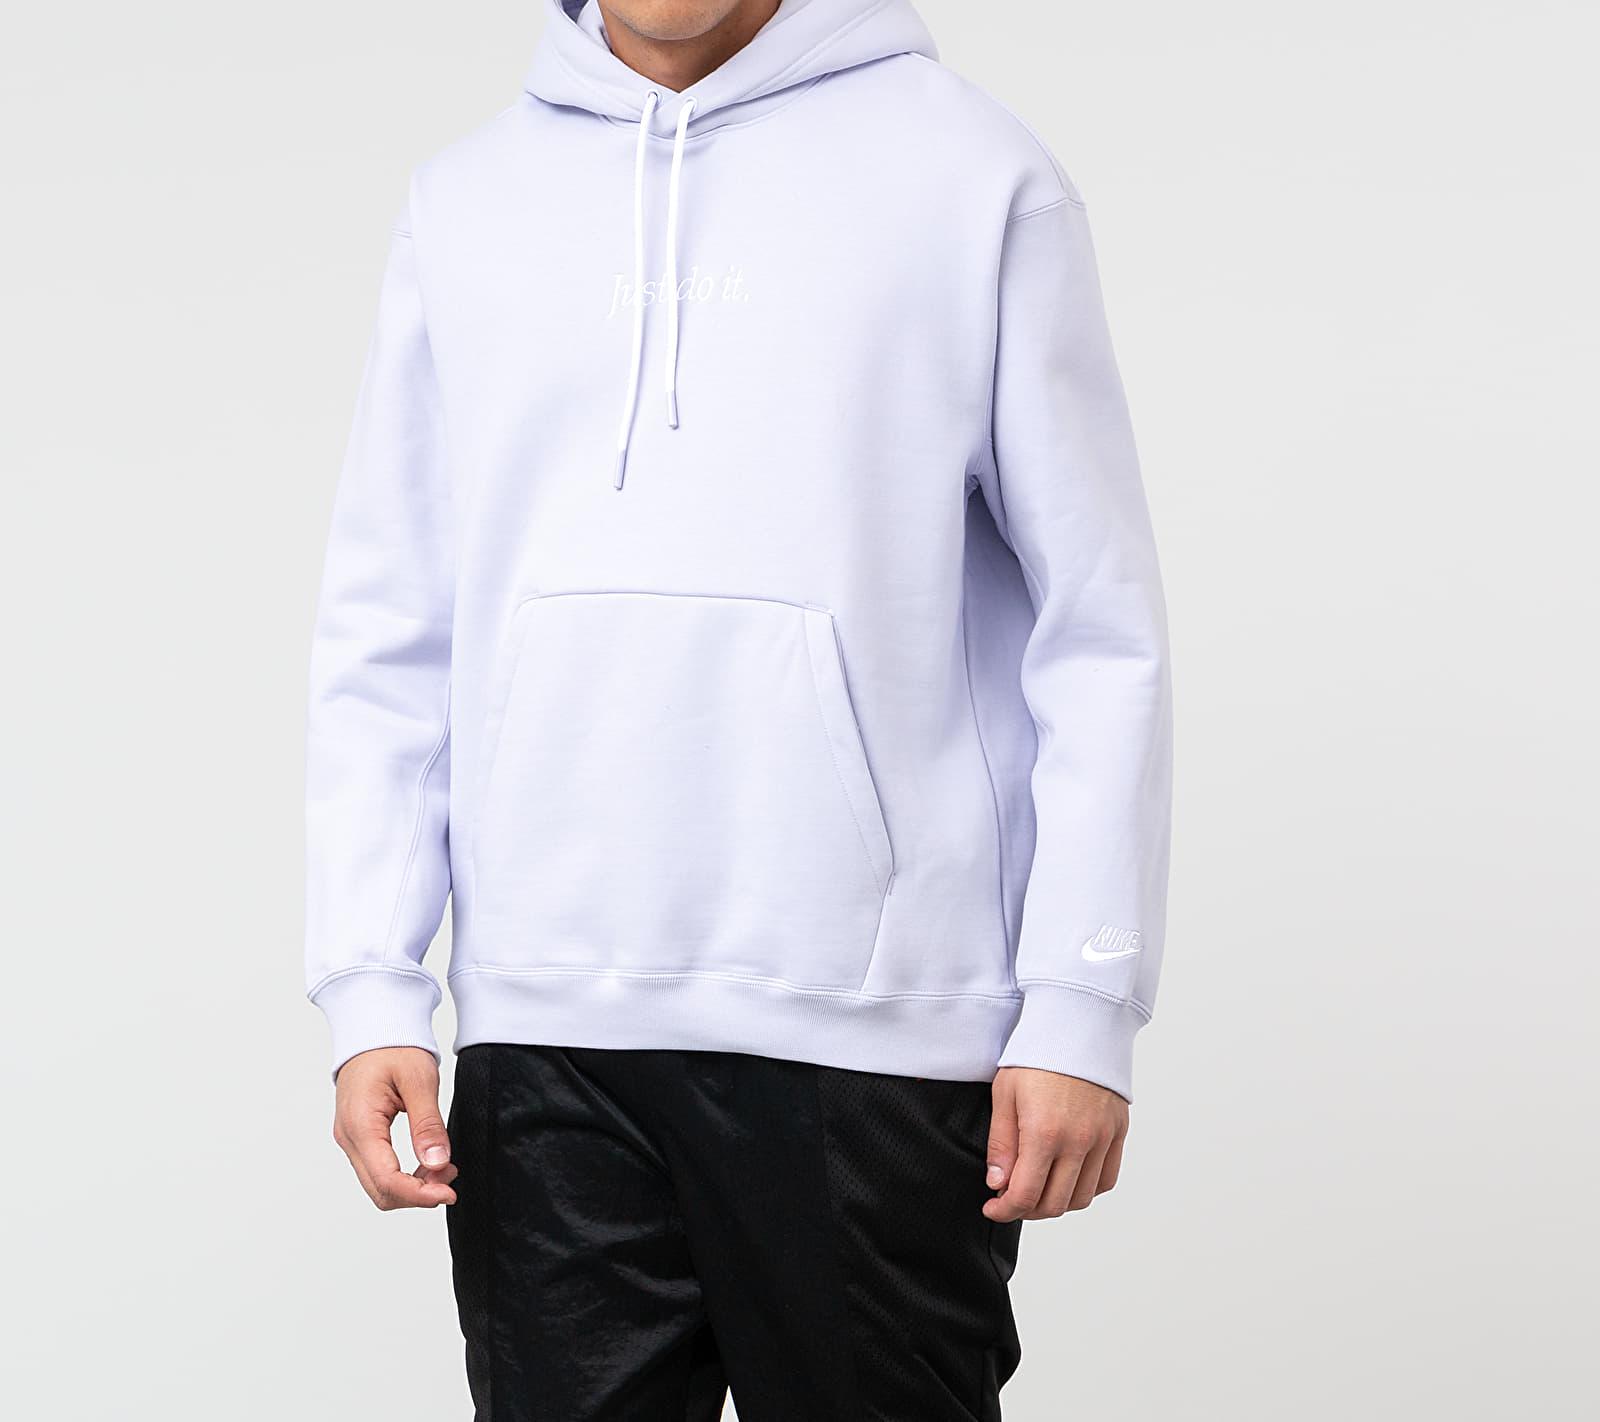 Nike Sportswear JDI Hvywt Hoodie Lavender Mist/ White, Purple